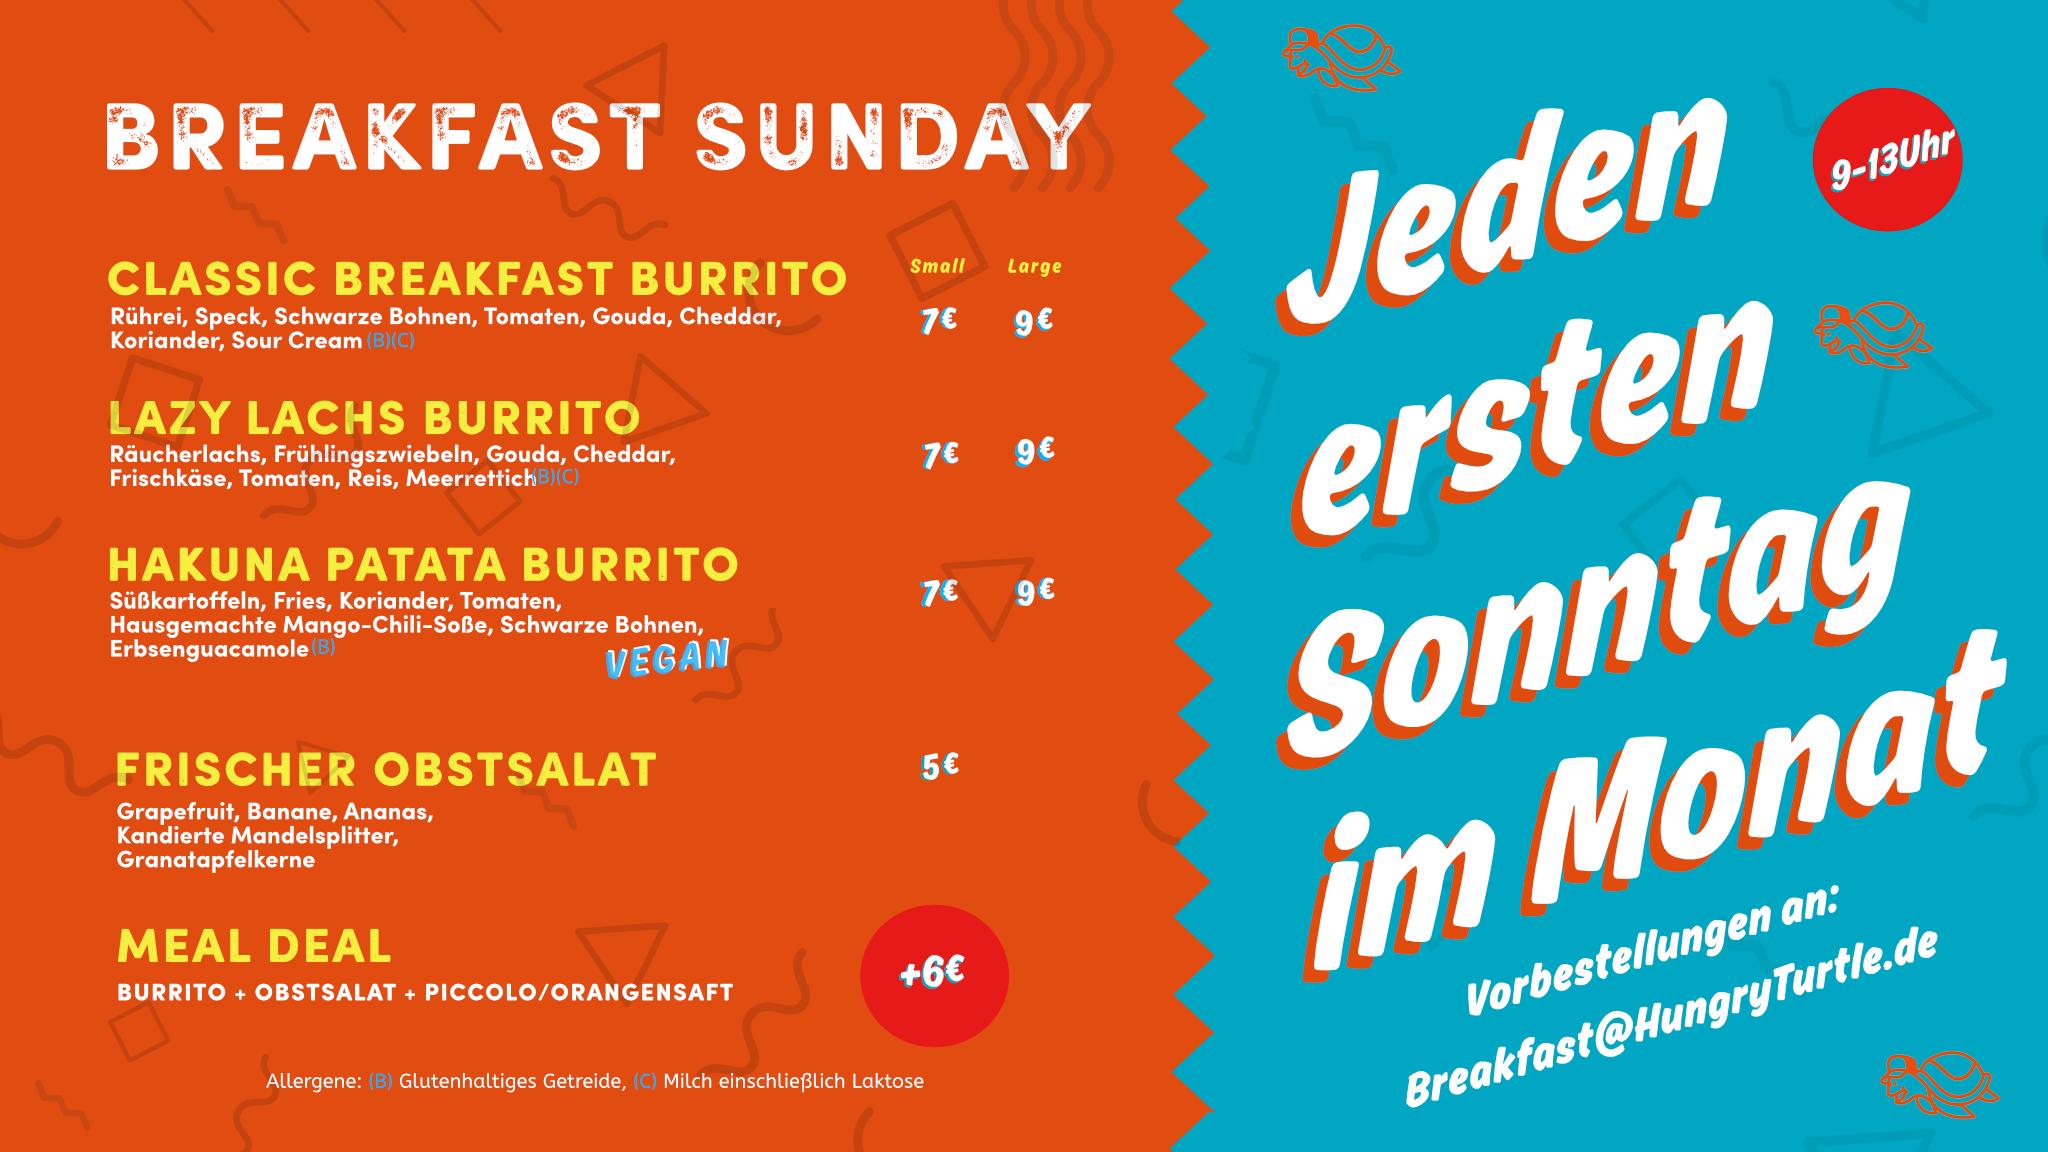 Breakfast Burritos Speisekarte